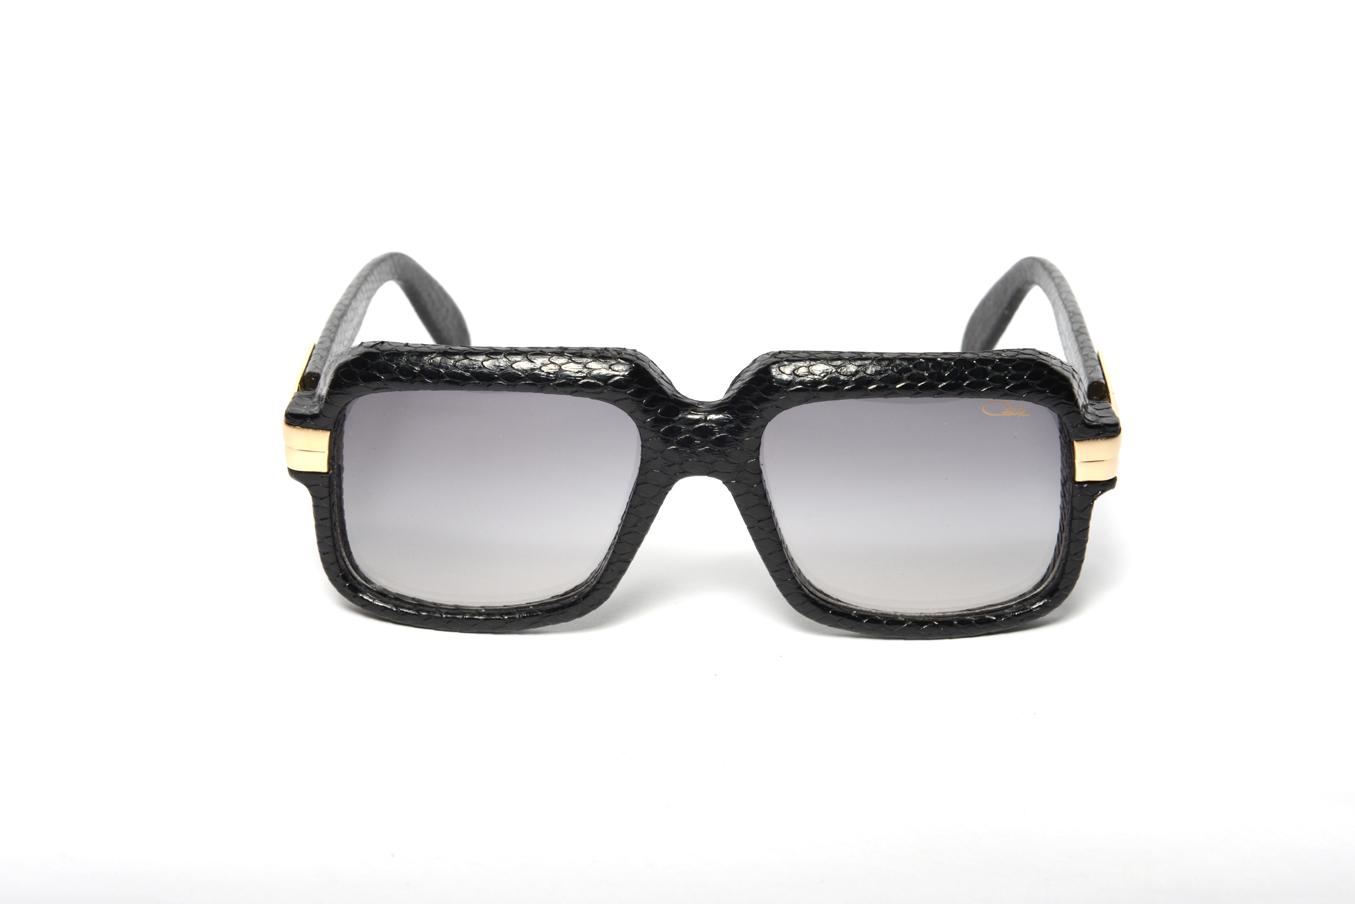 5c85a42ad12 Cazal Eyewear 607. Cazal Sunglasses 607